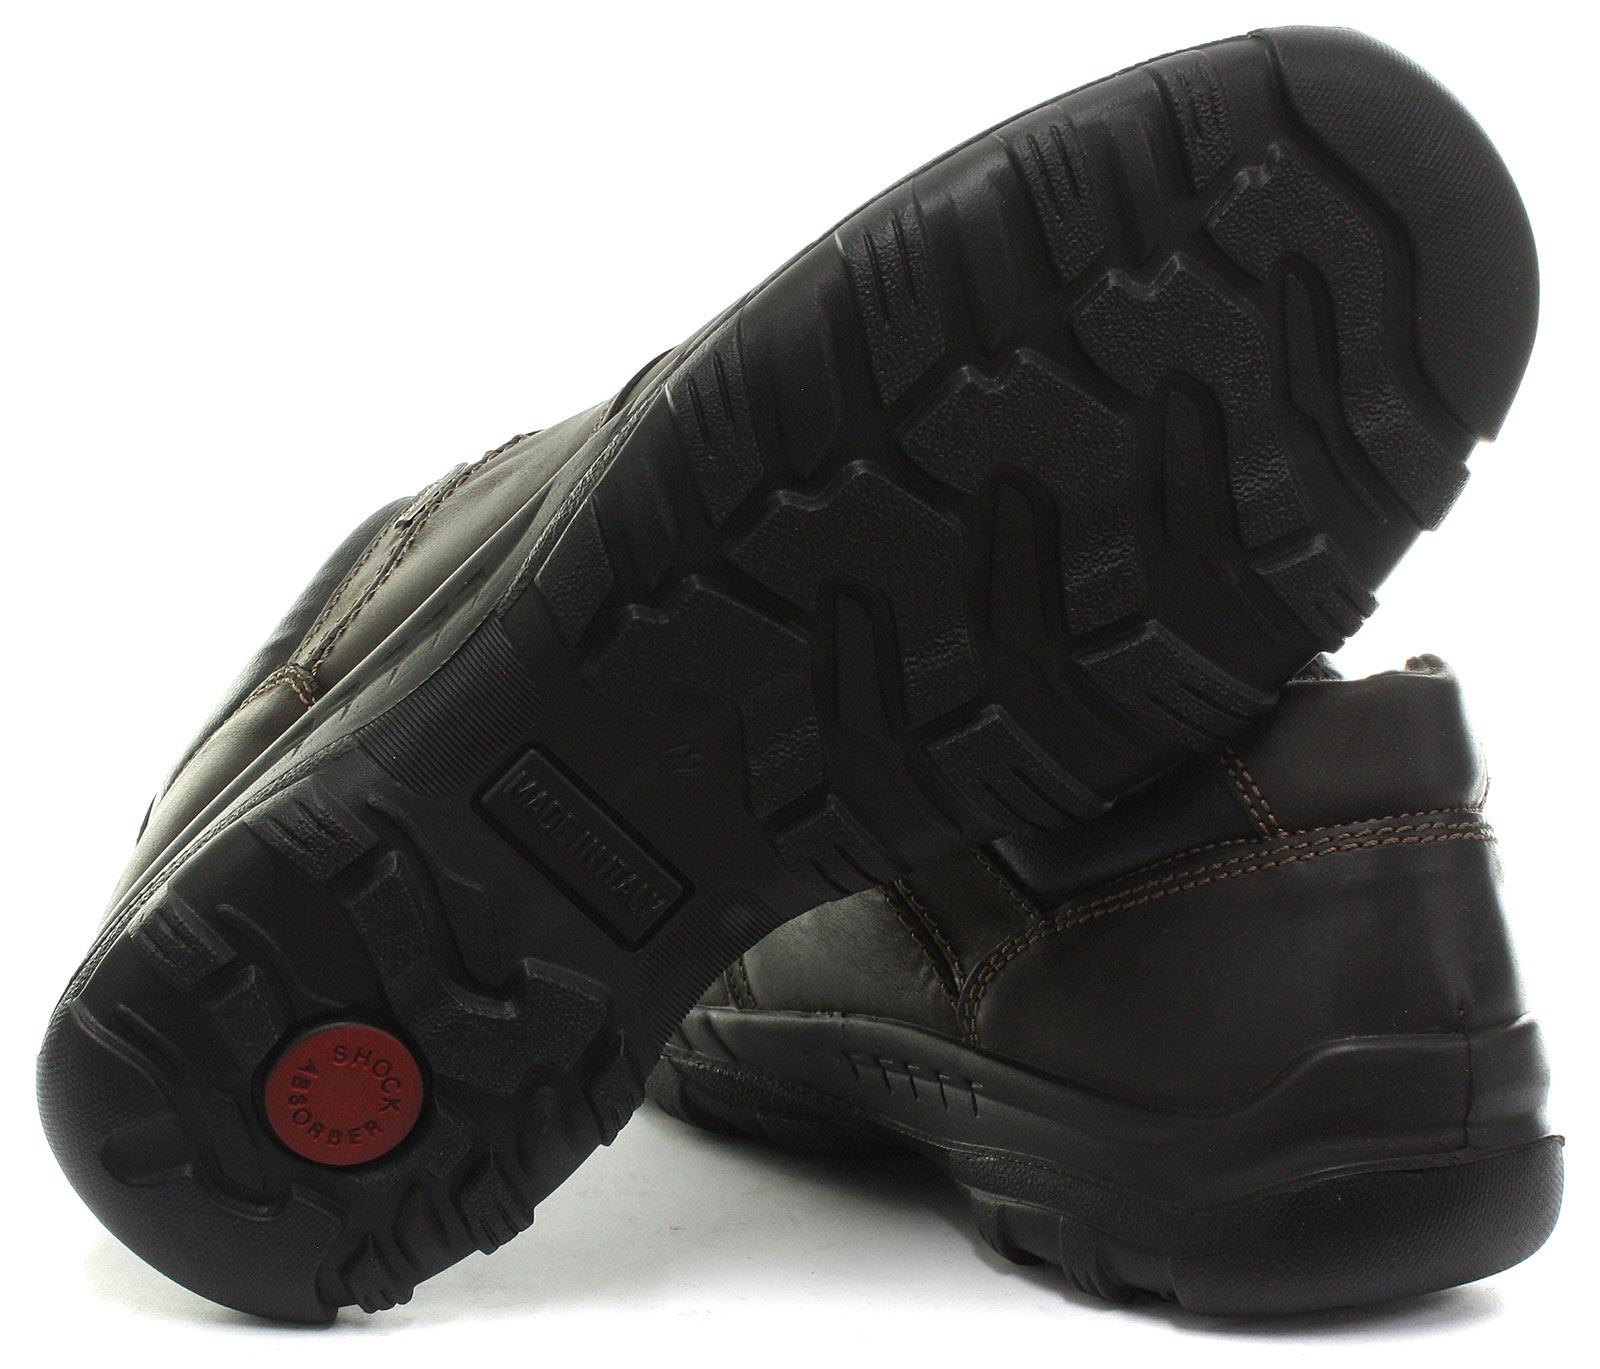 ImacTex-Mens-3-Eye-Leisure-Water-Resistant-Walking-Shoes-ALL-SIZES miniature 3